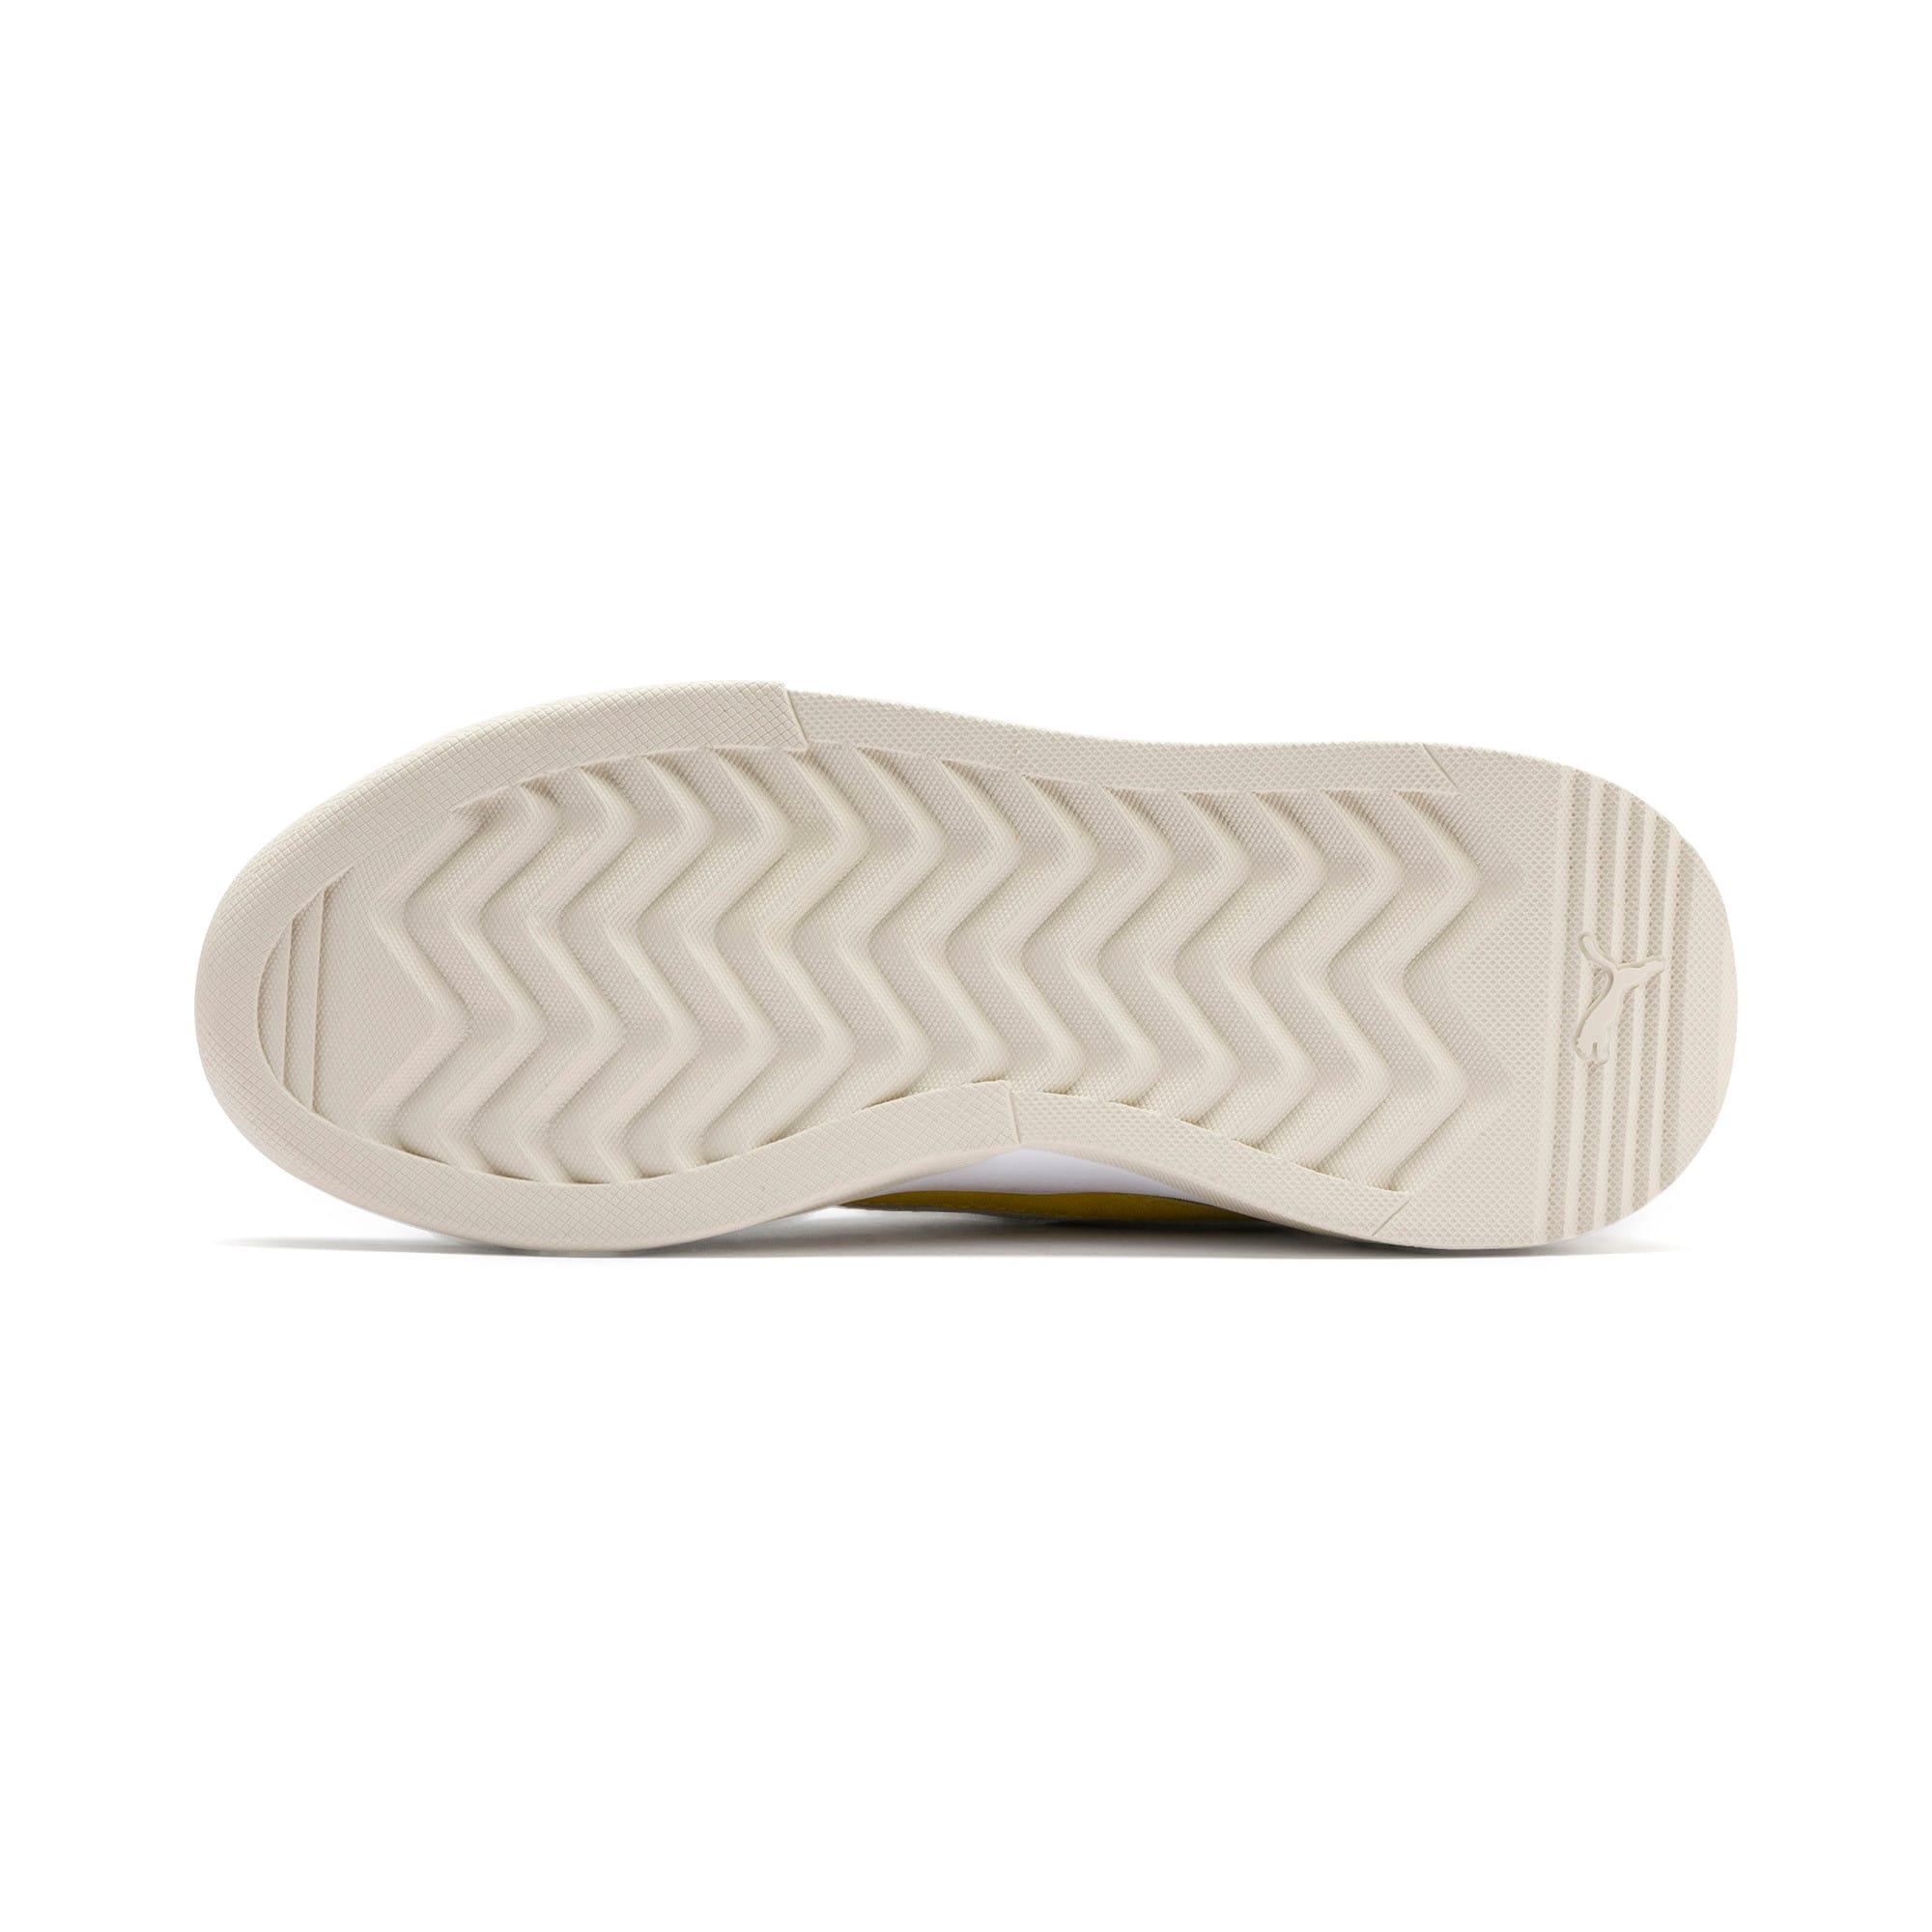 Thumbnail 5 of Aeon Heritage Women's Sneakers, Puma White-Sulphur, medium